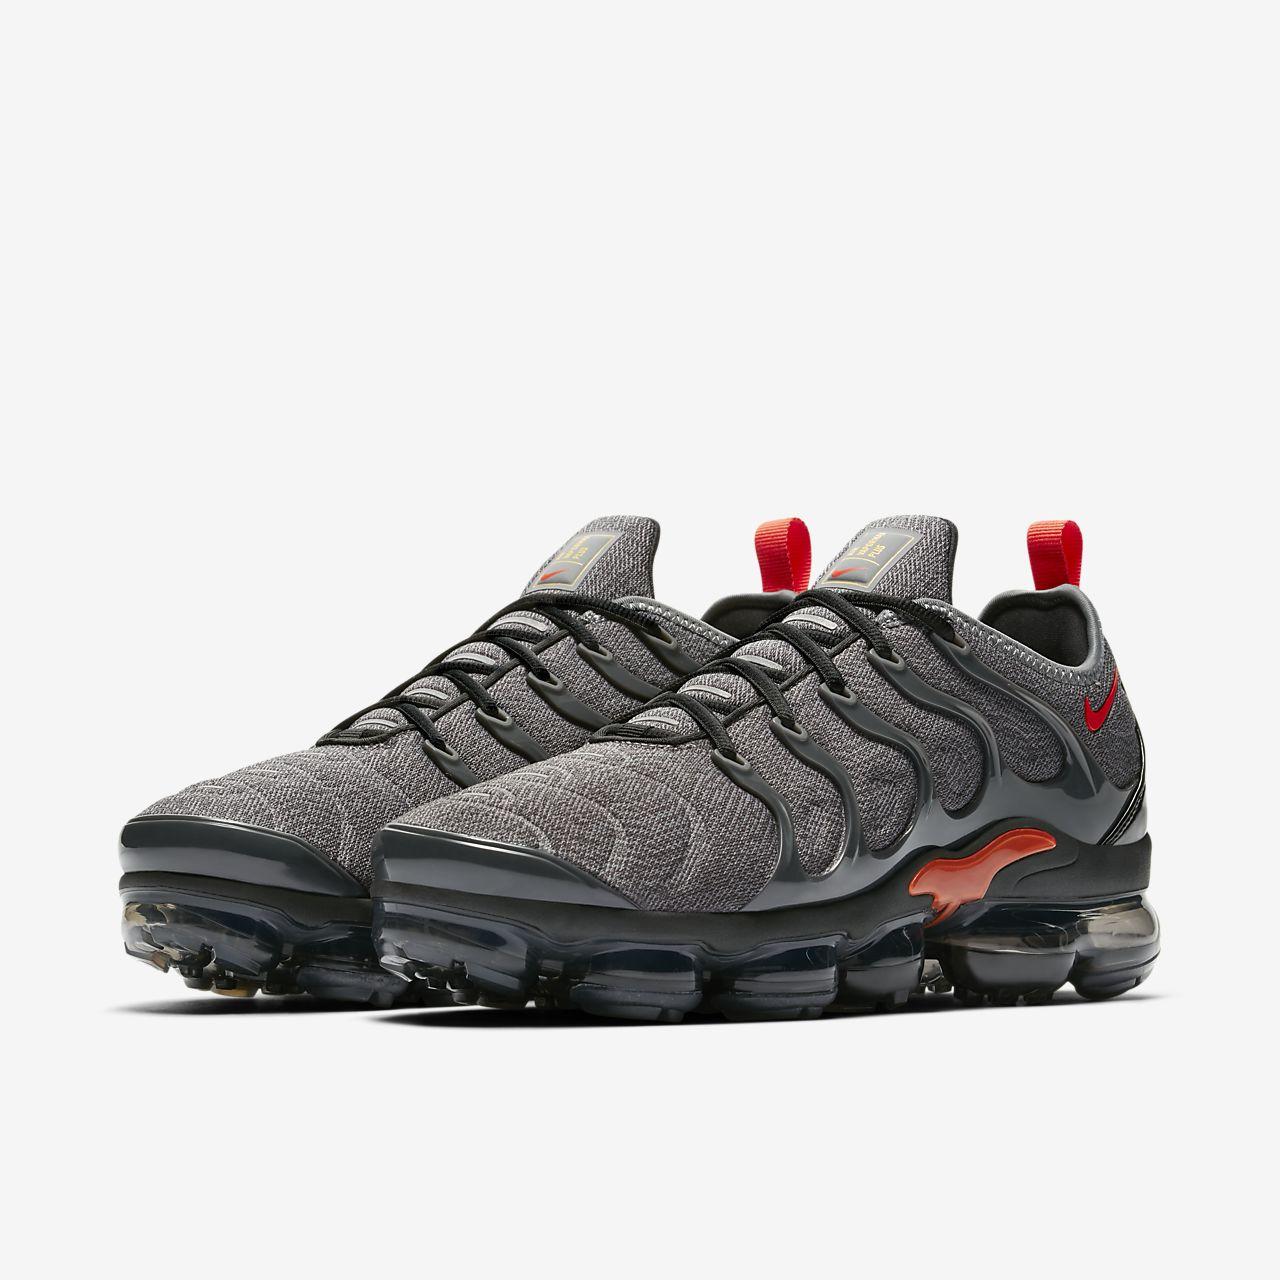 super popular 31472 af137 ... Nike Air VaporMax Plus Men s Shoe